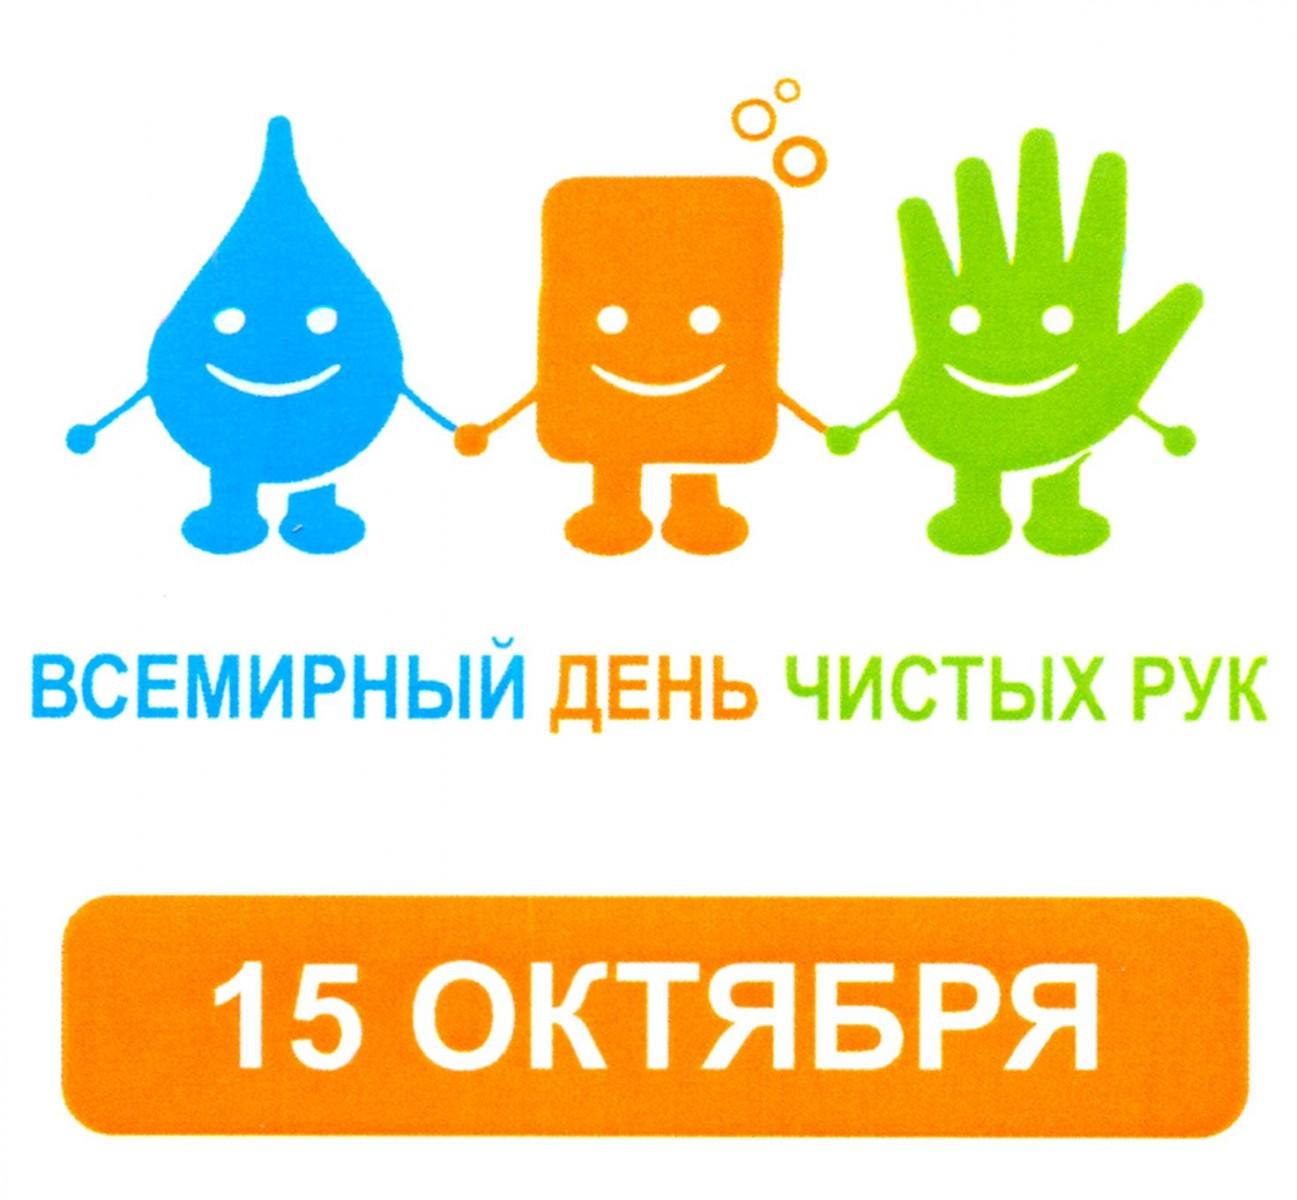 Картинки по запросу картинки чистые руки